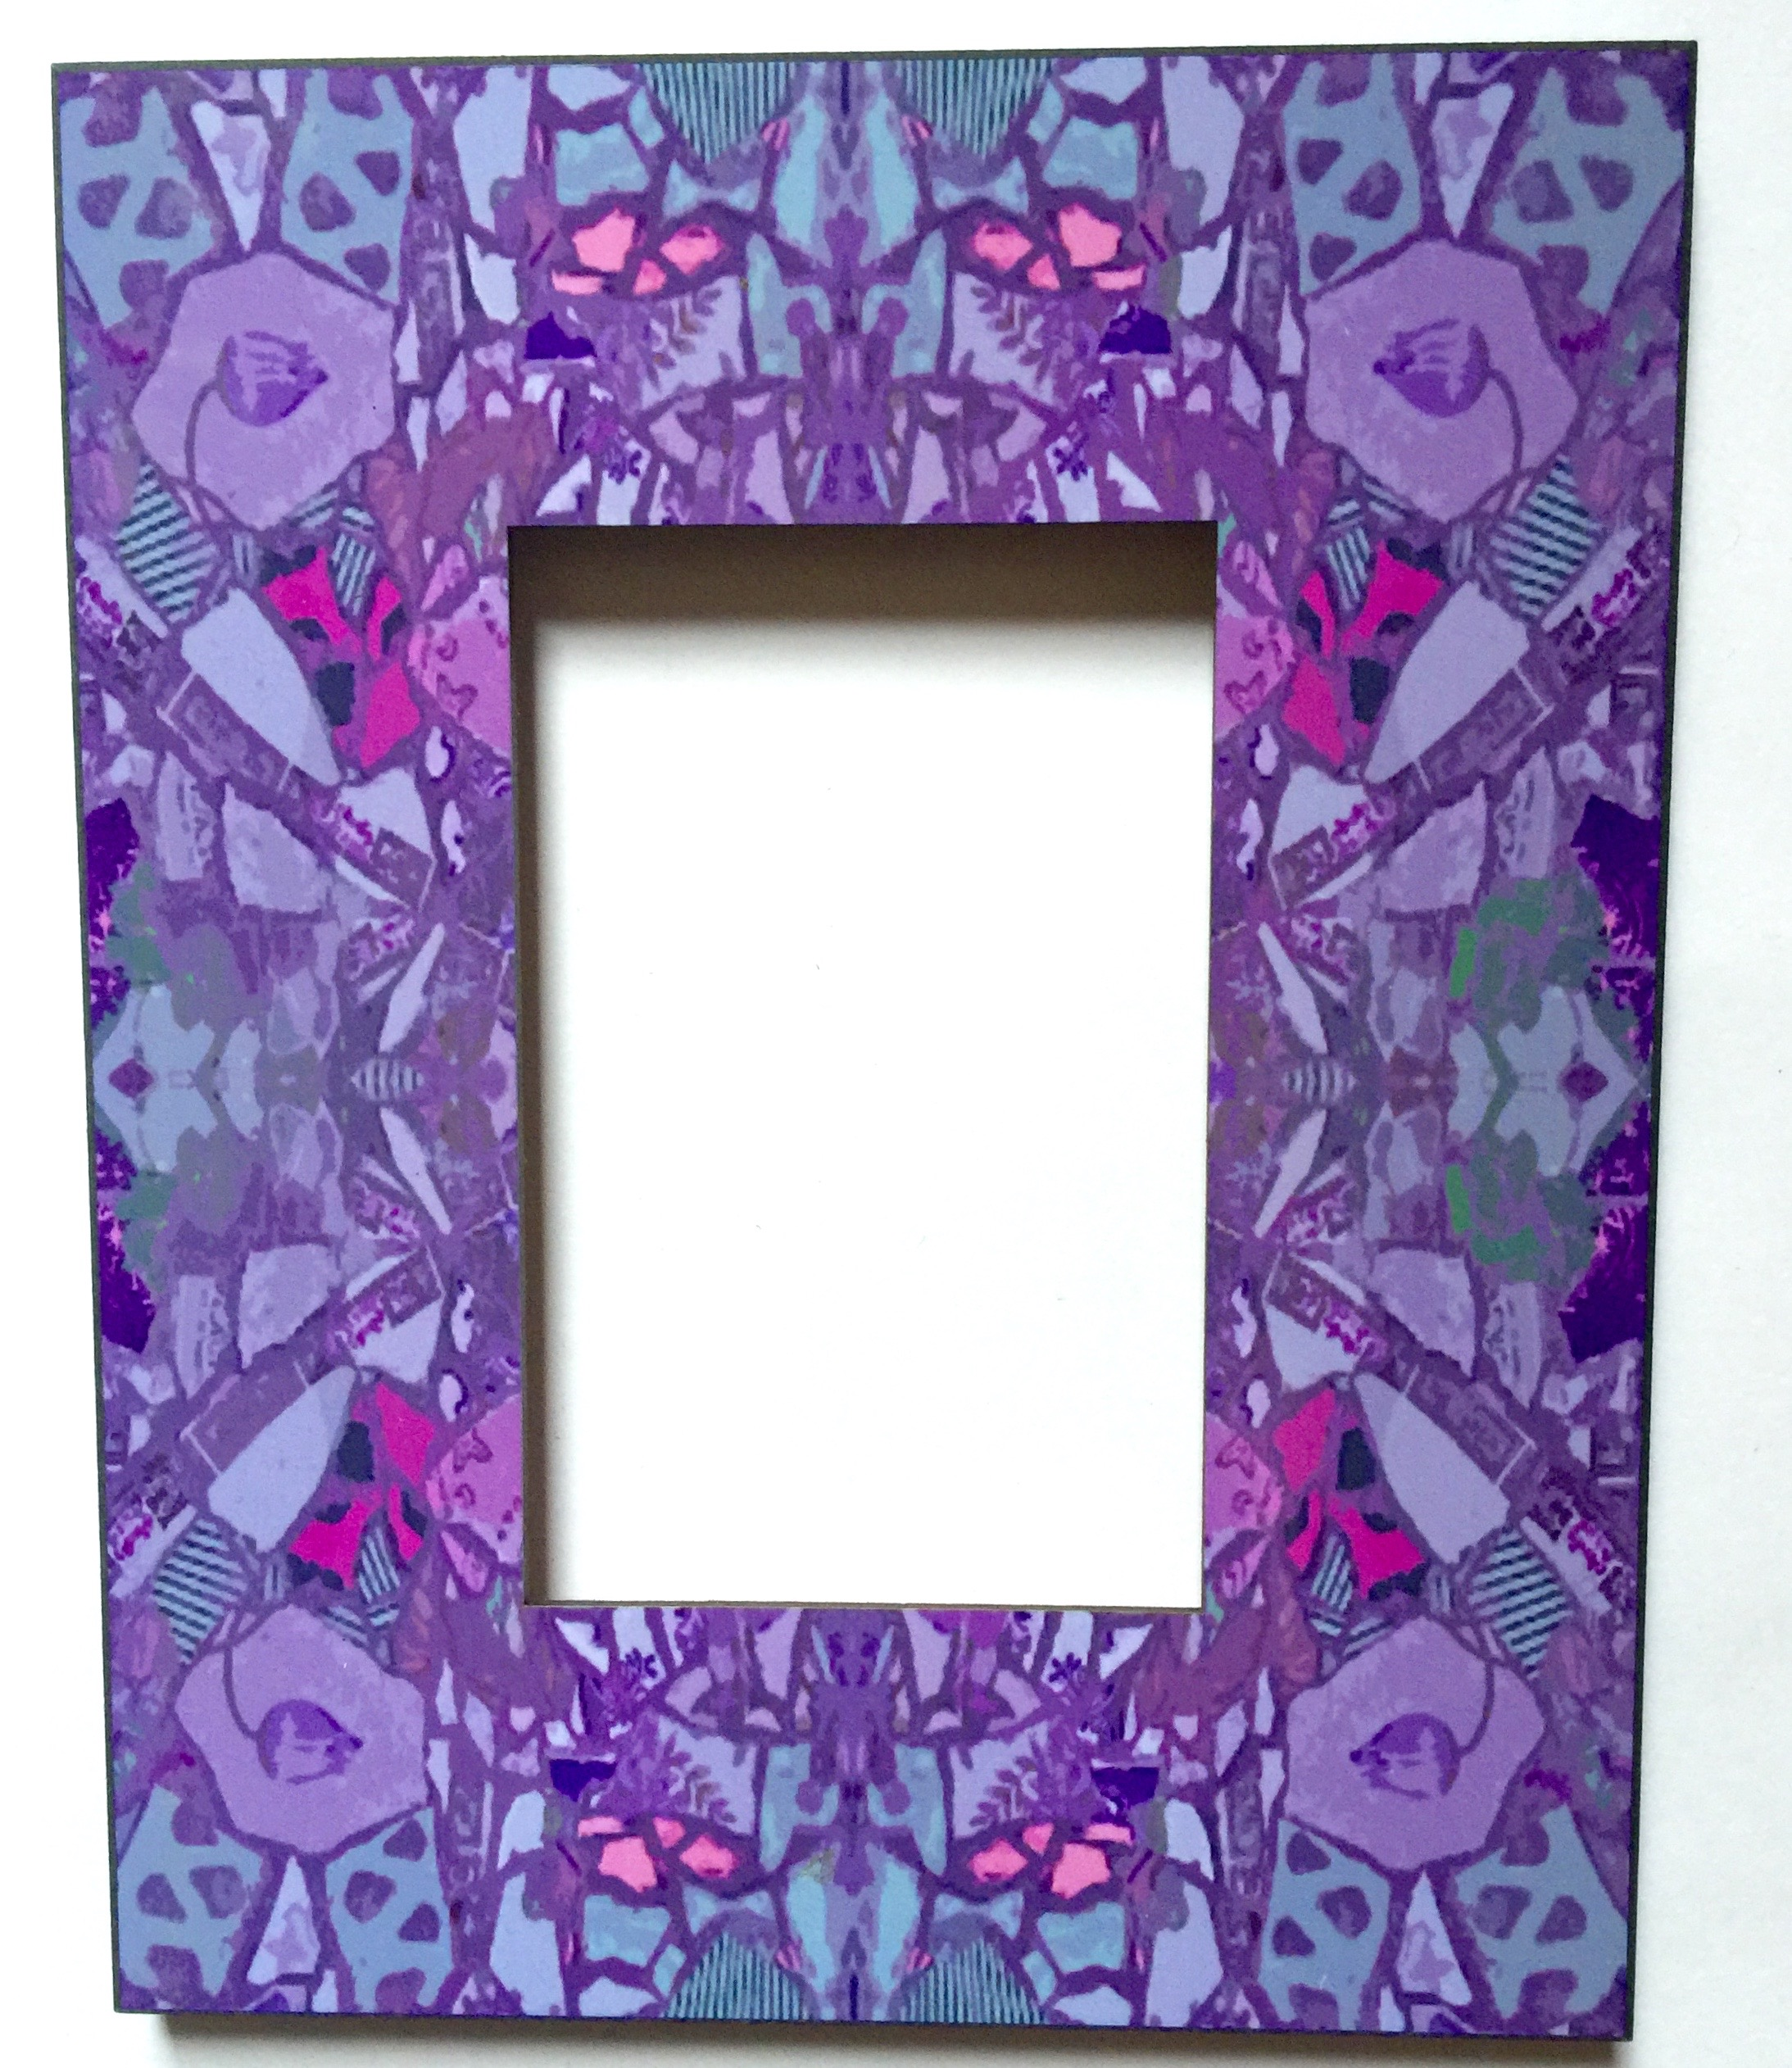 Purple Printed Frame 4x6 $65